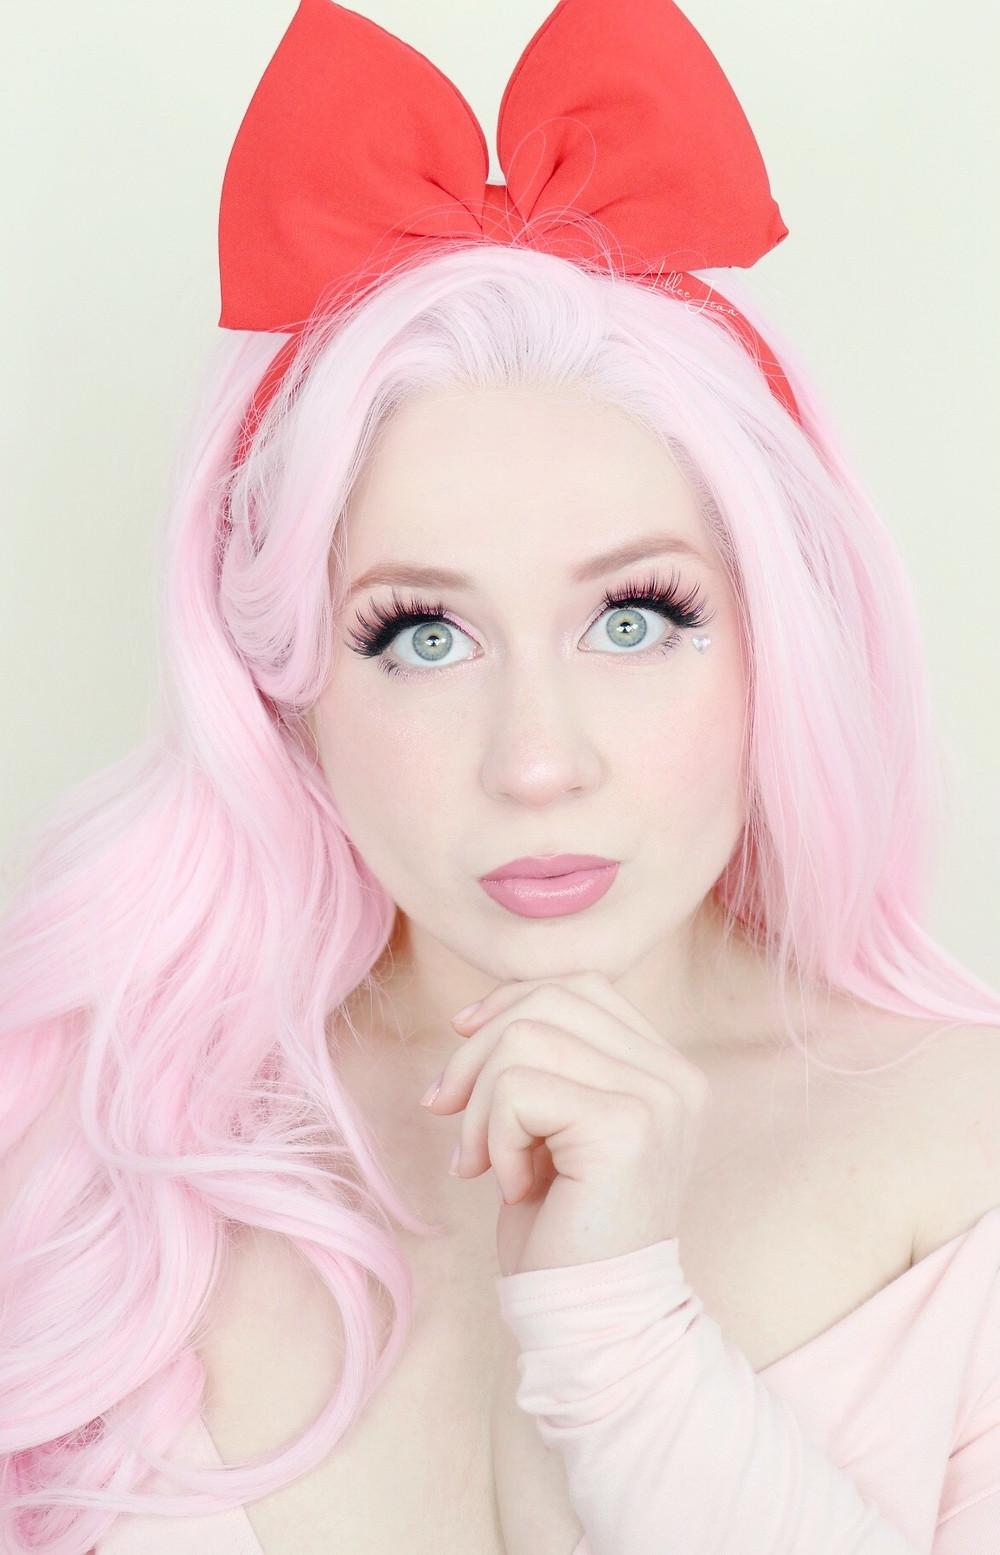 NINTENDO Kirby Tarte LIL' JUICY Wearable Pink Rhinestone Makeup Tutorial 2021 | Lillee Jean